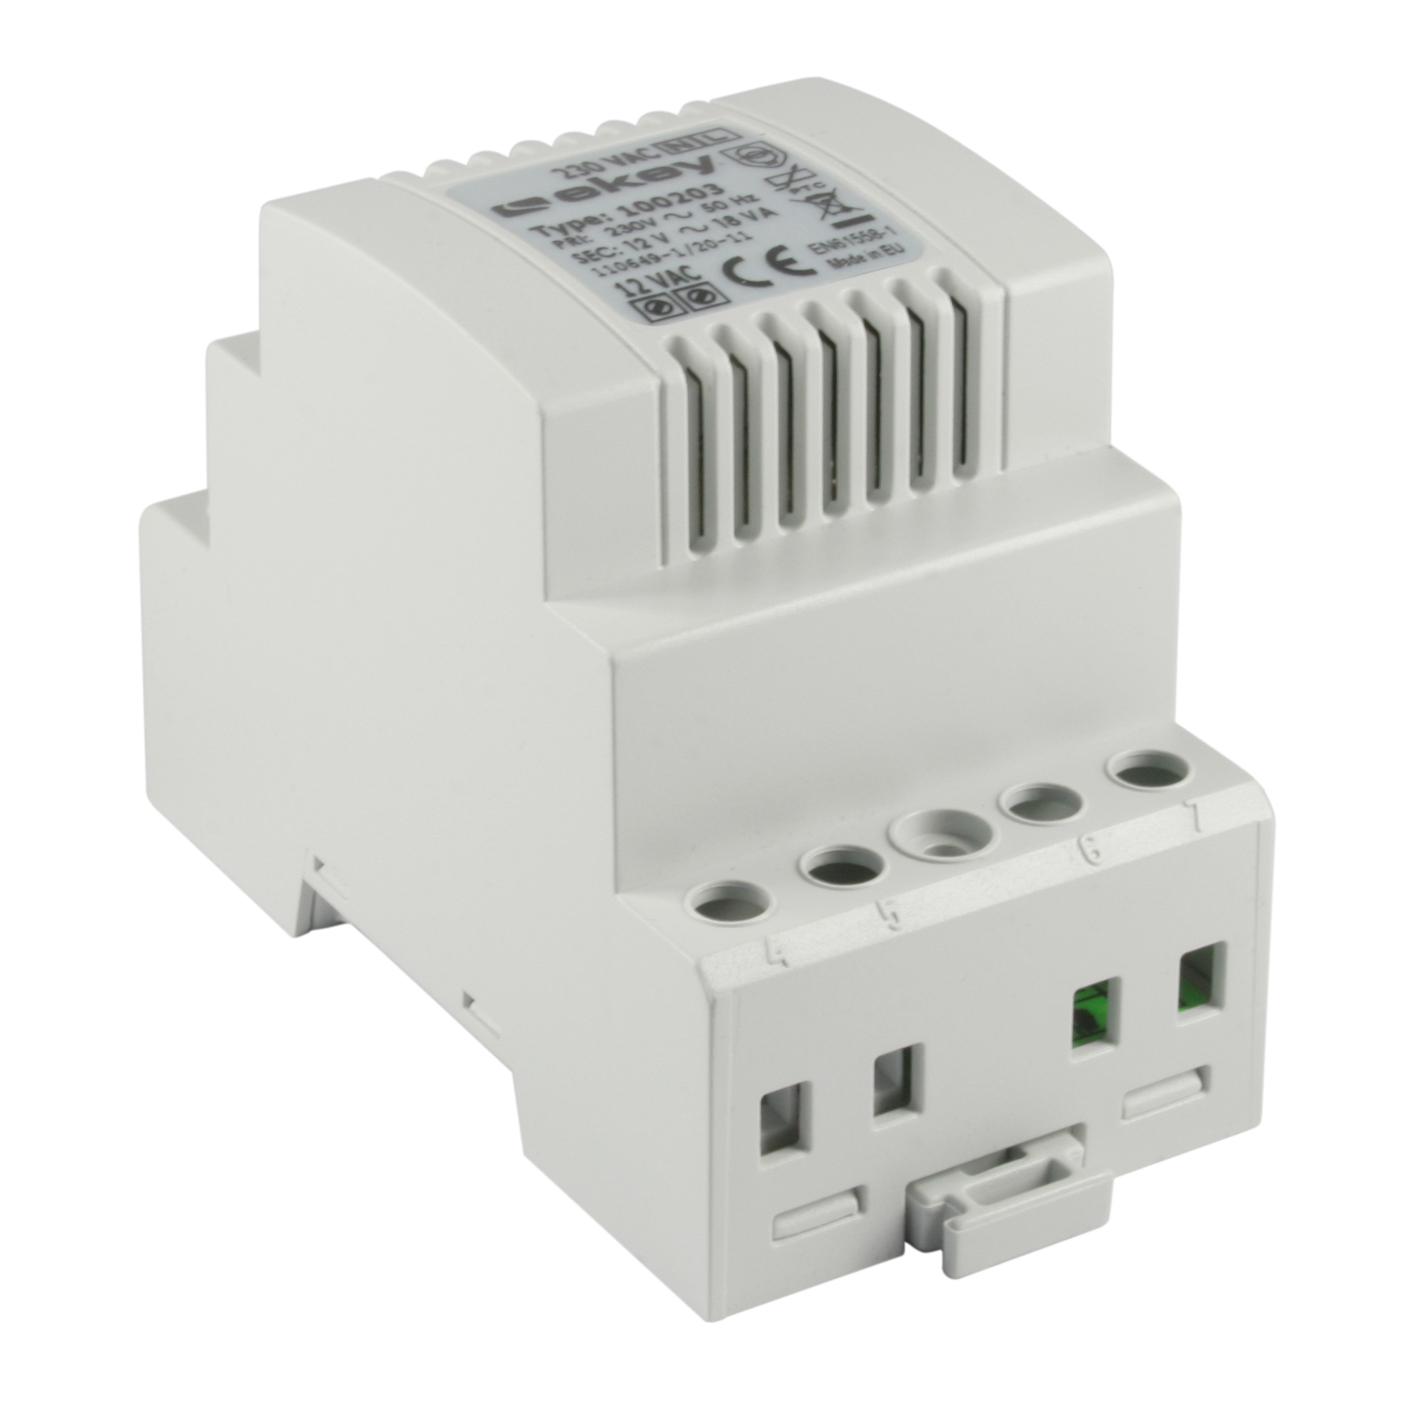 1 Stk Netzteil Ausgang: 12VAC, Leistung: 1,5A, Reiheneinbau 3 TE EK100203--